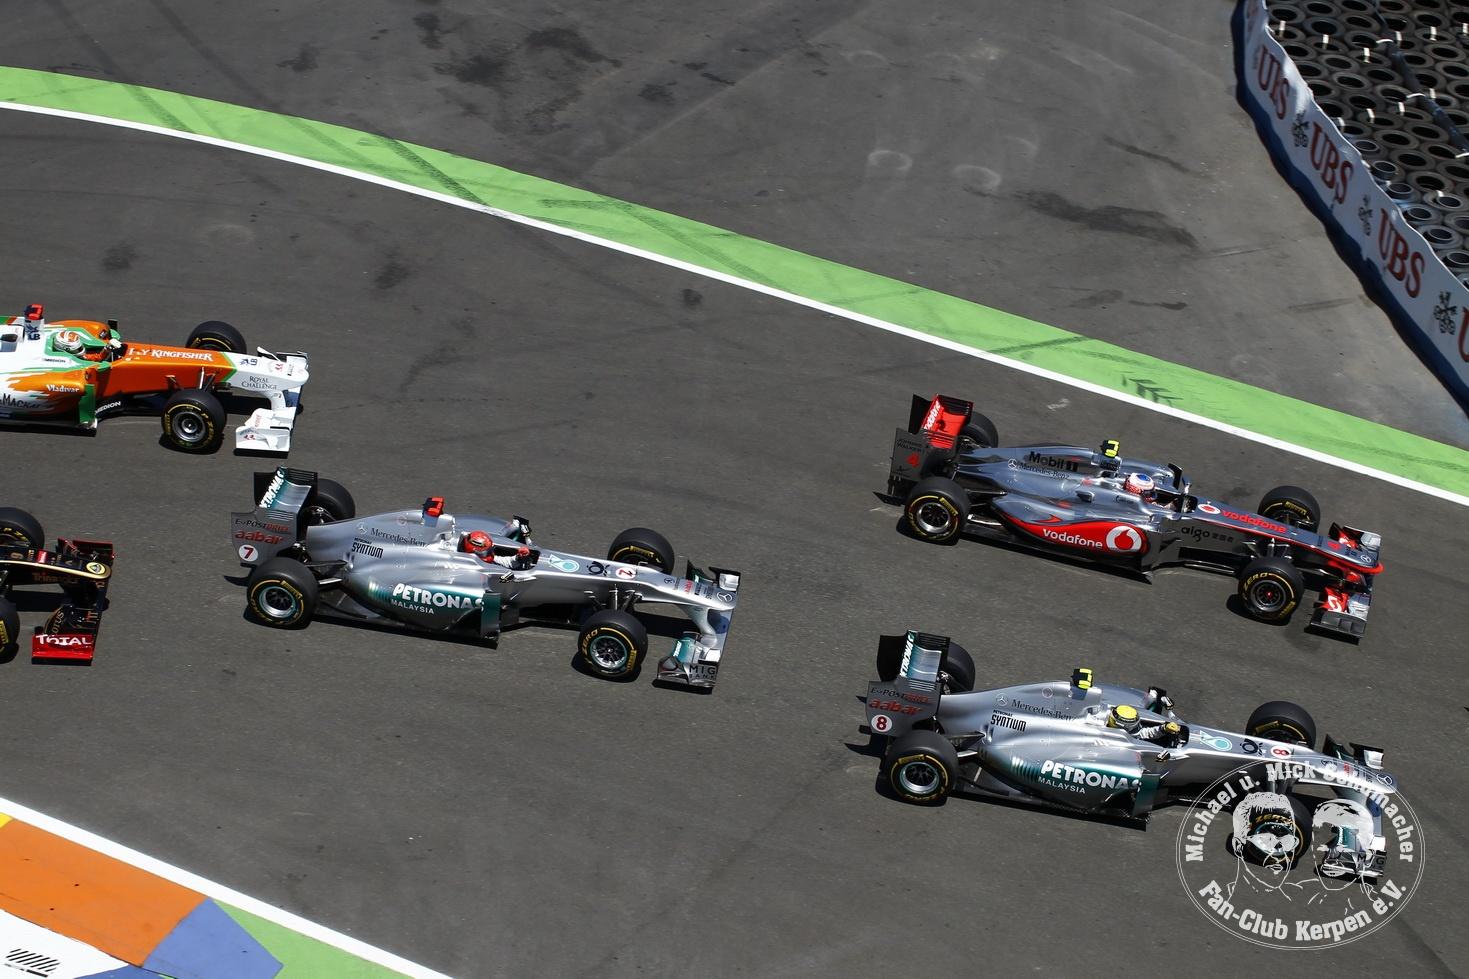 Formel 1, Grand Prix Europa 2011, Valencia, Strassenkurs, 26.06.2011